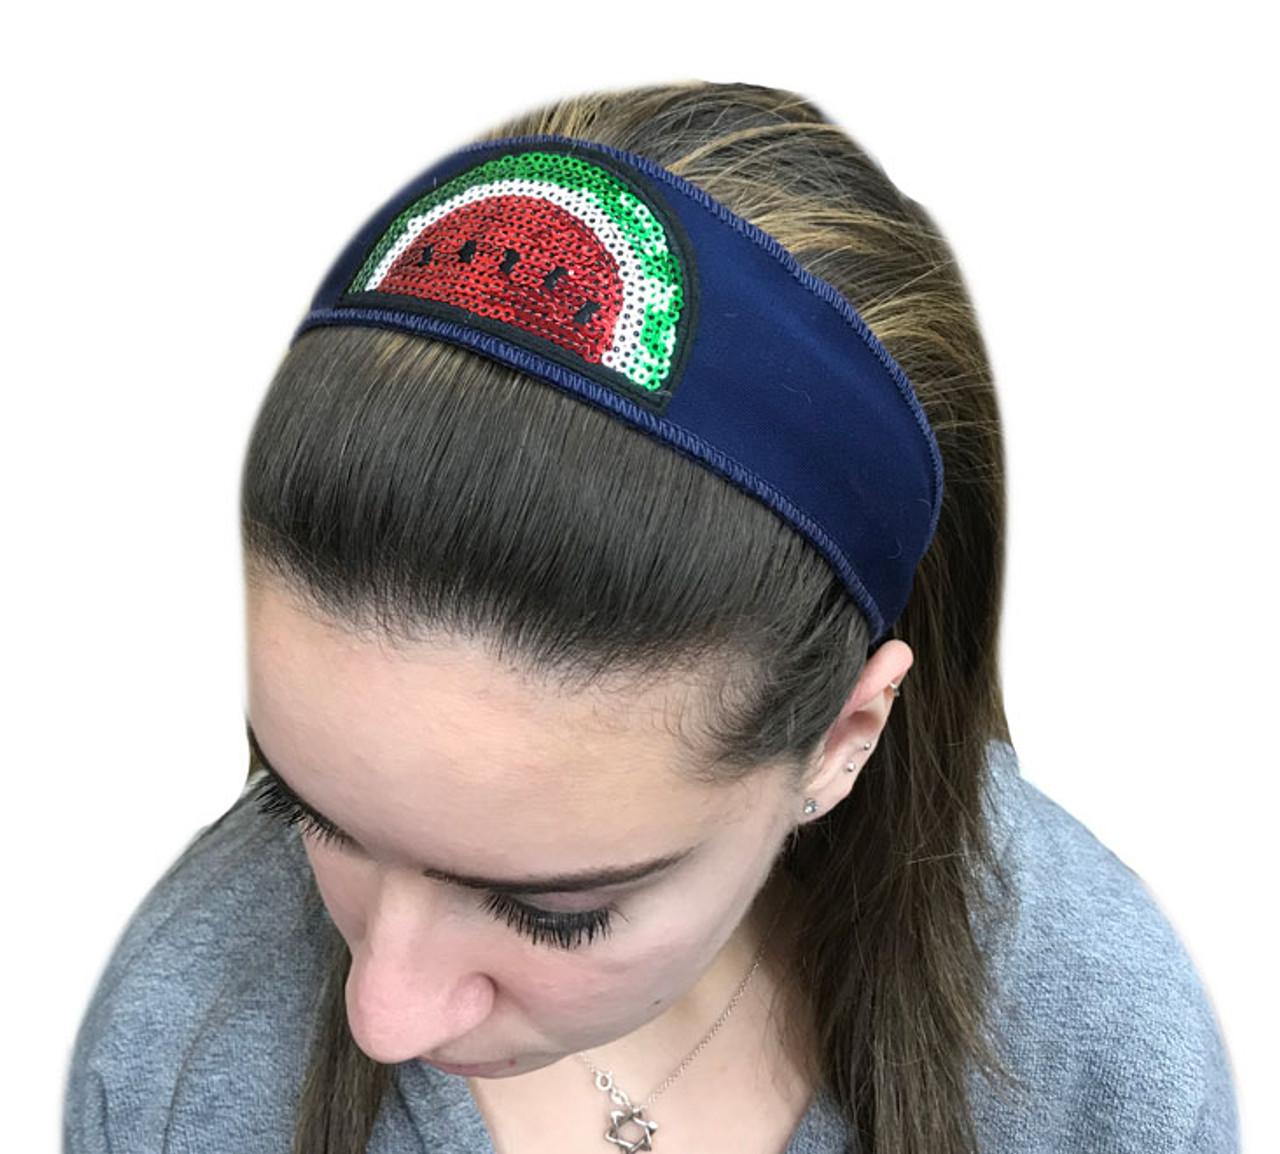 Watermelon Patch Headband